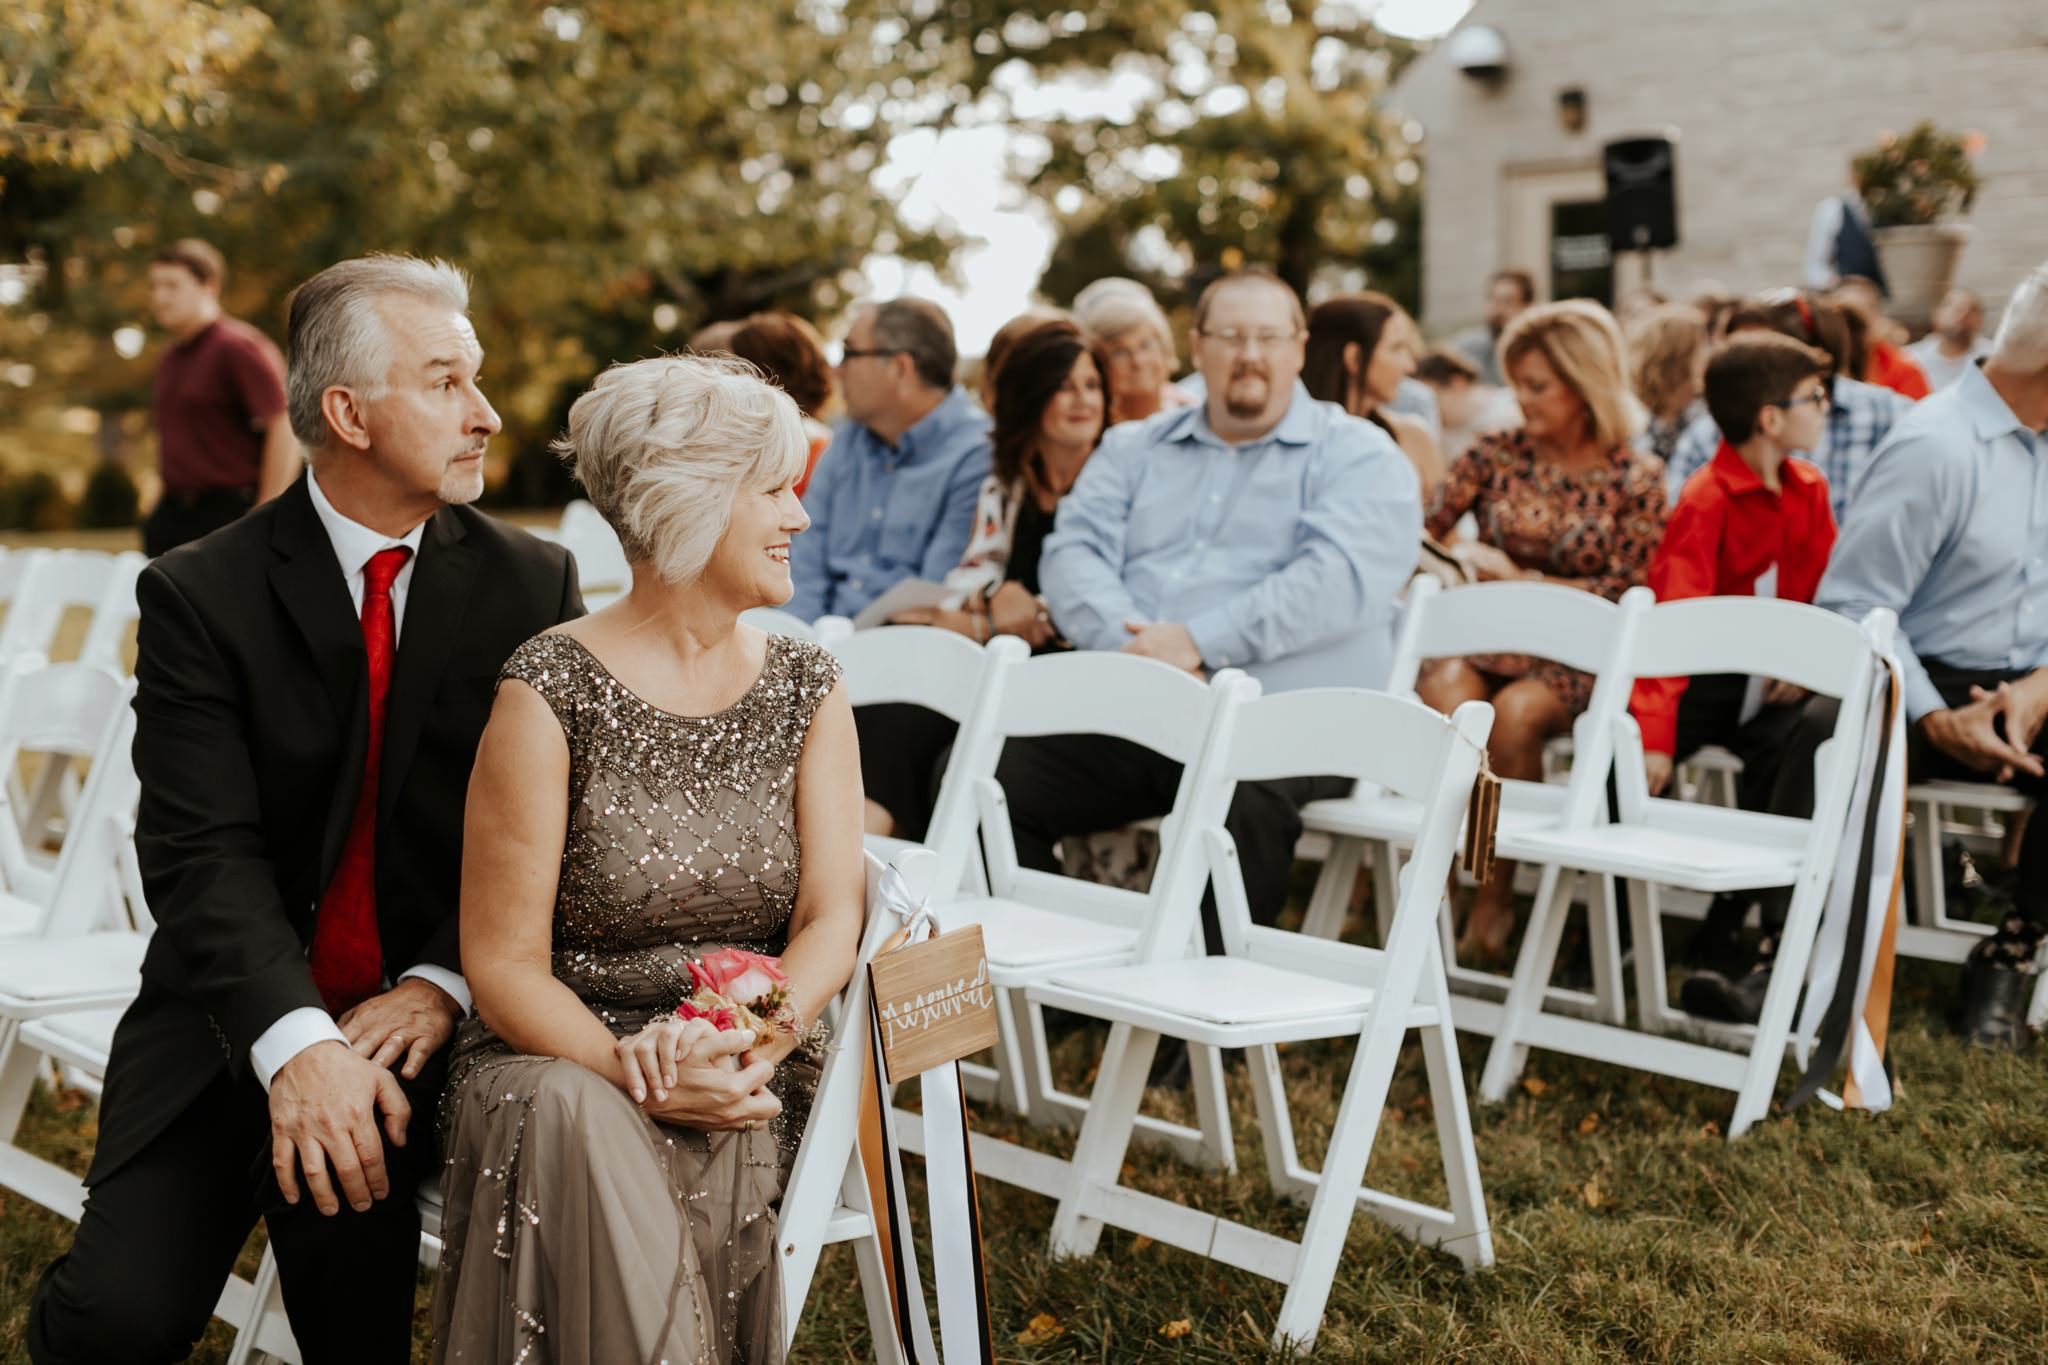 17-09-15 Lindsey and Brandon Wedding Edited-636_WEB.jpg